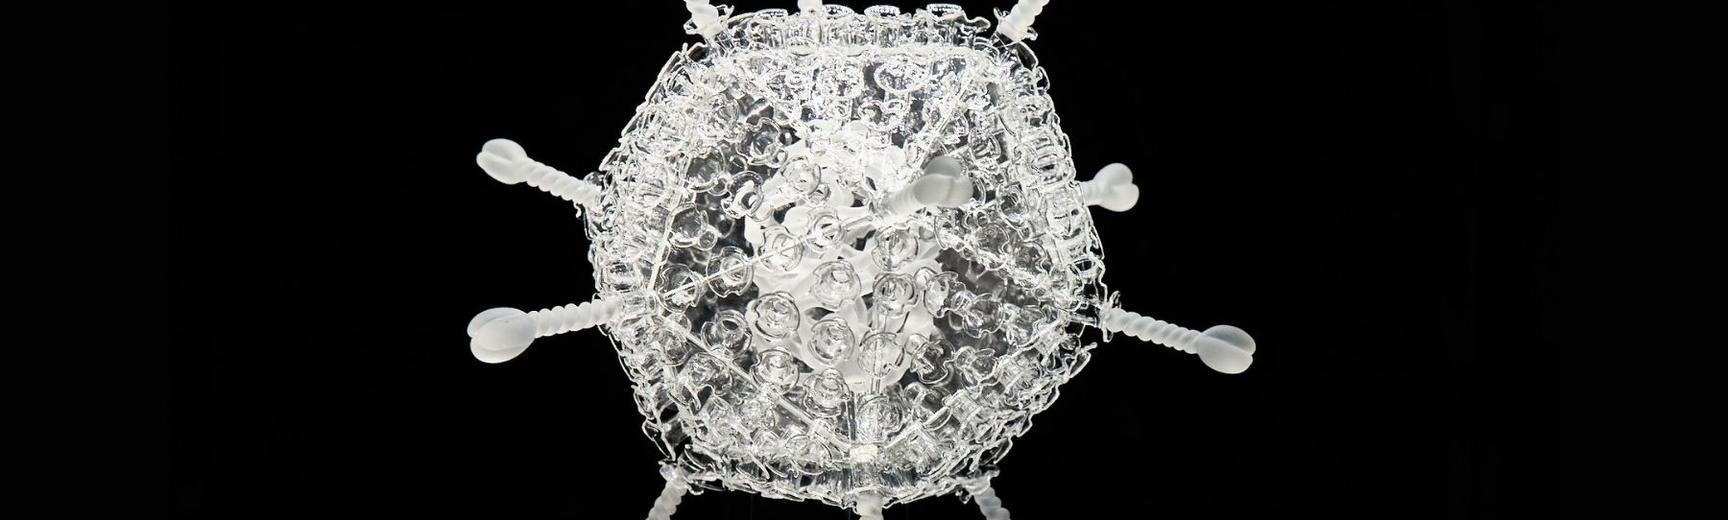 Luke Jerram COVID-19 vaccine glass sculpture (single nanoparticle)